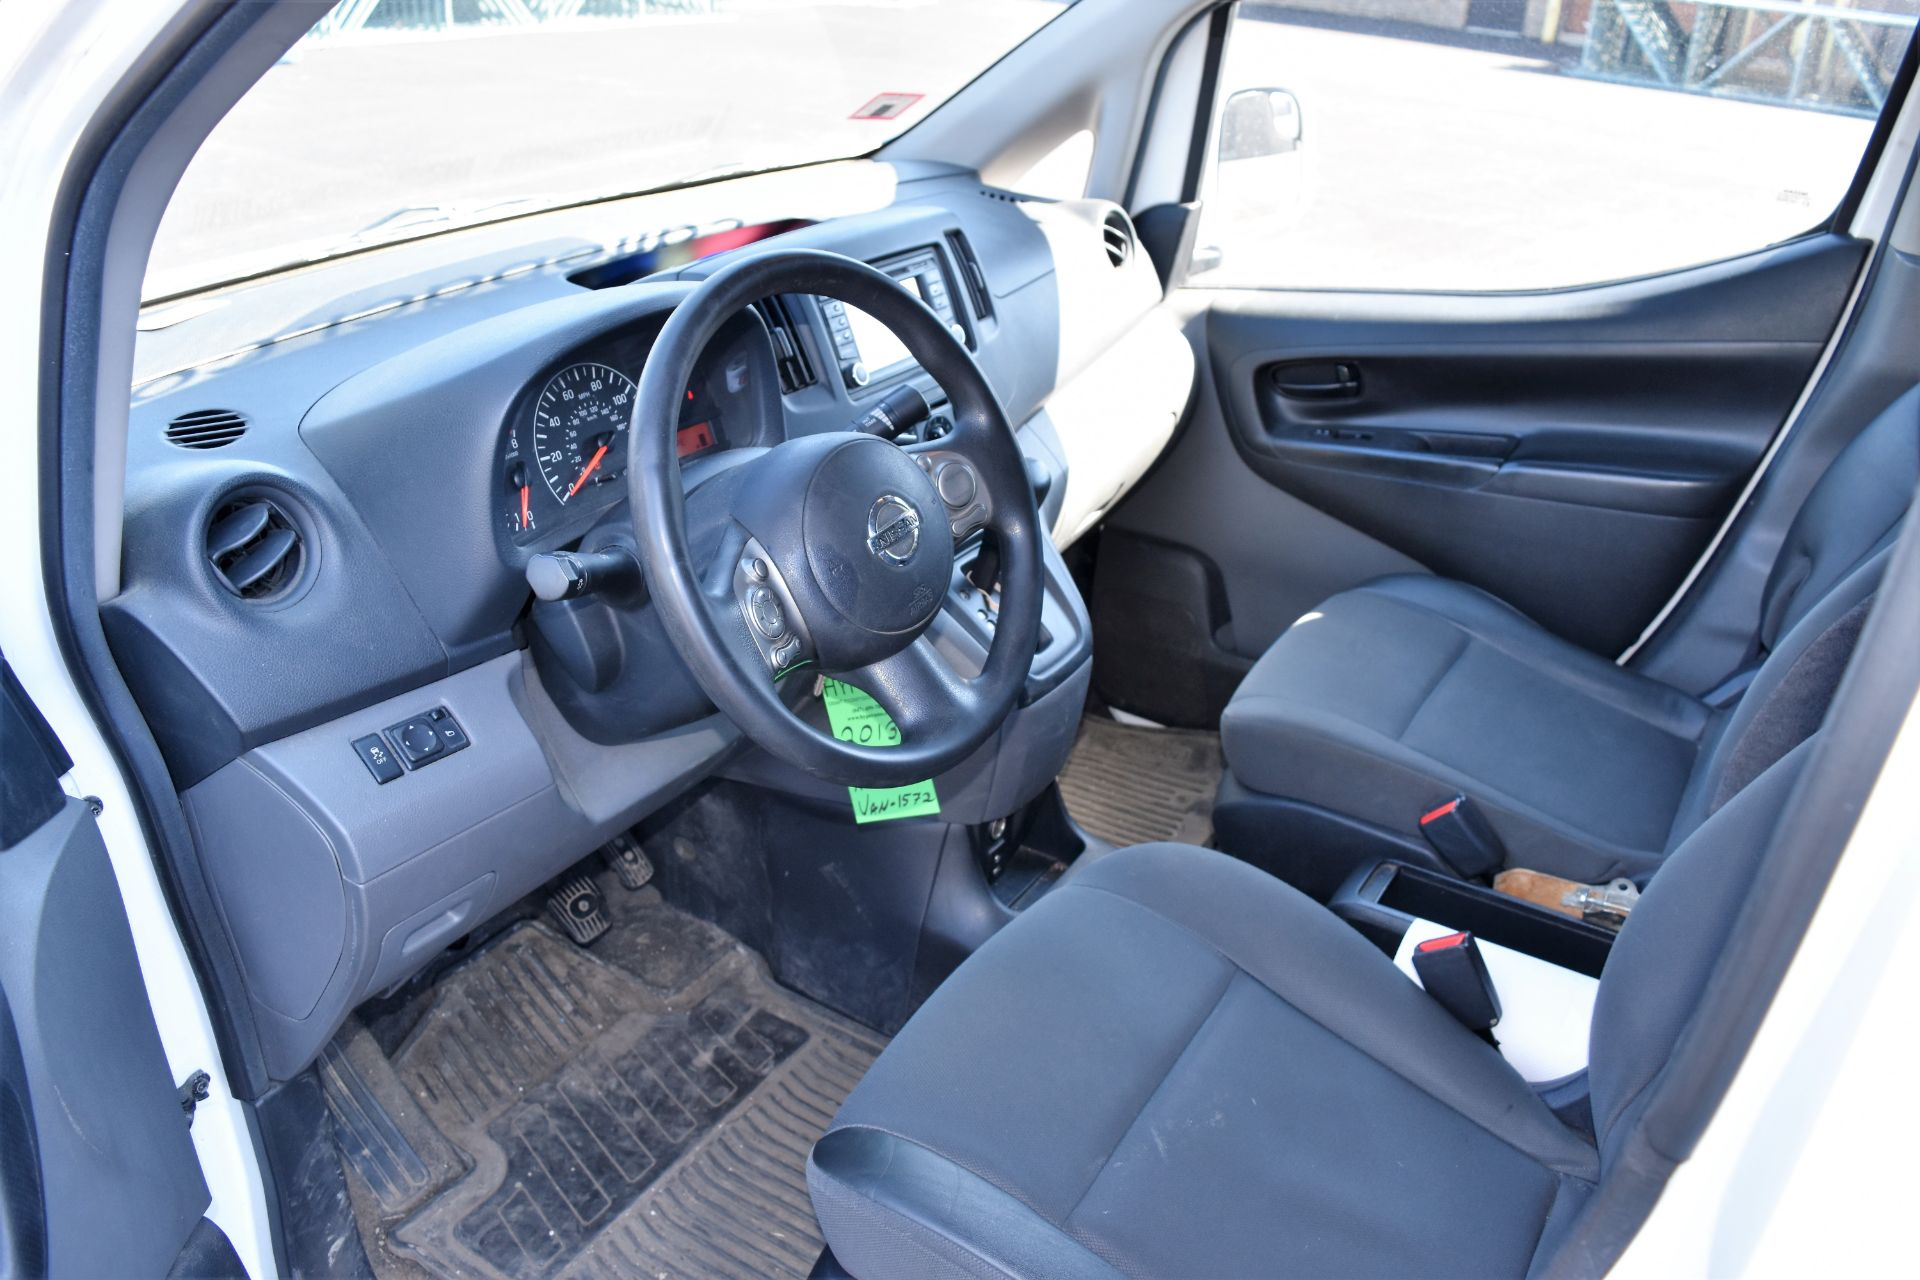 2013 Nissan NV200 Delivery Van - Image 45 of 54